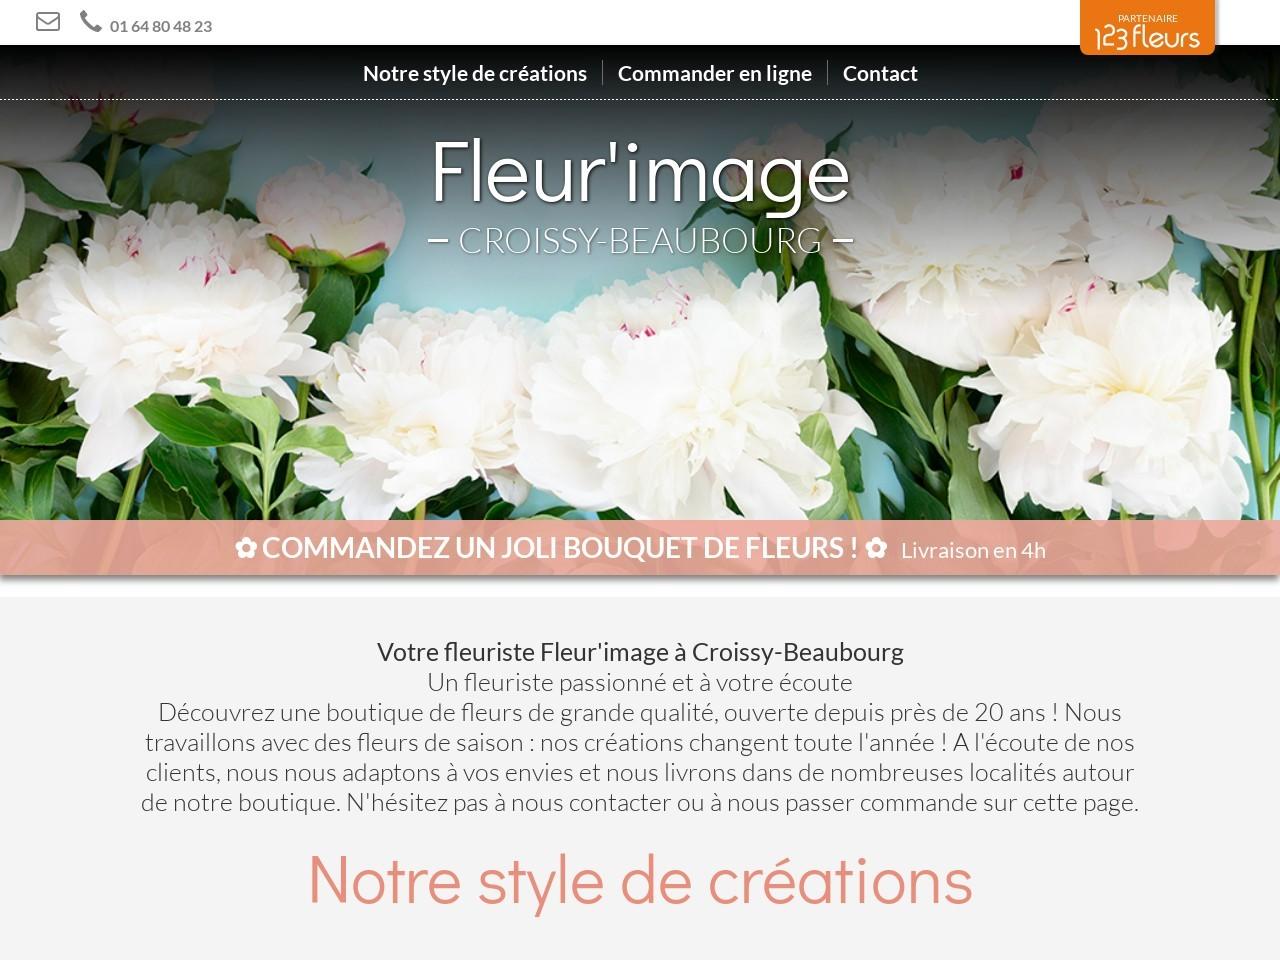 Site fleuriste Fleurimage - 123fleurs